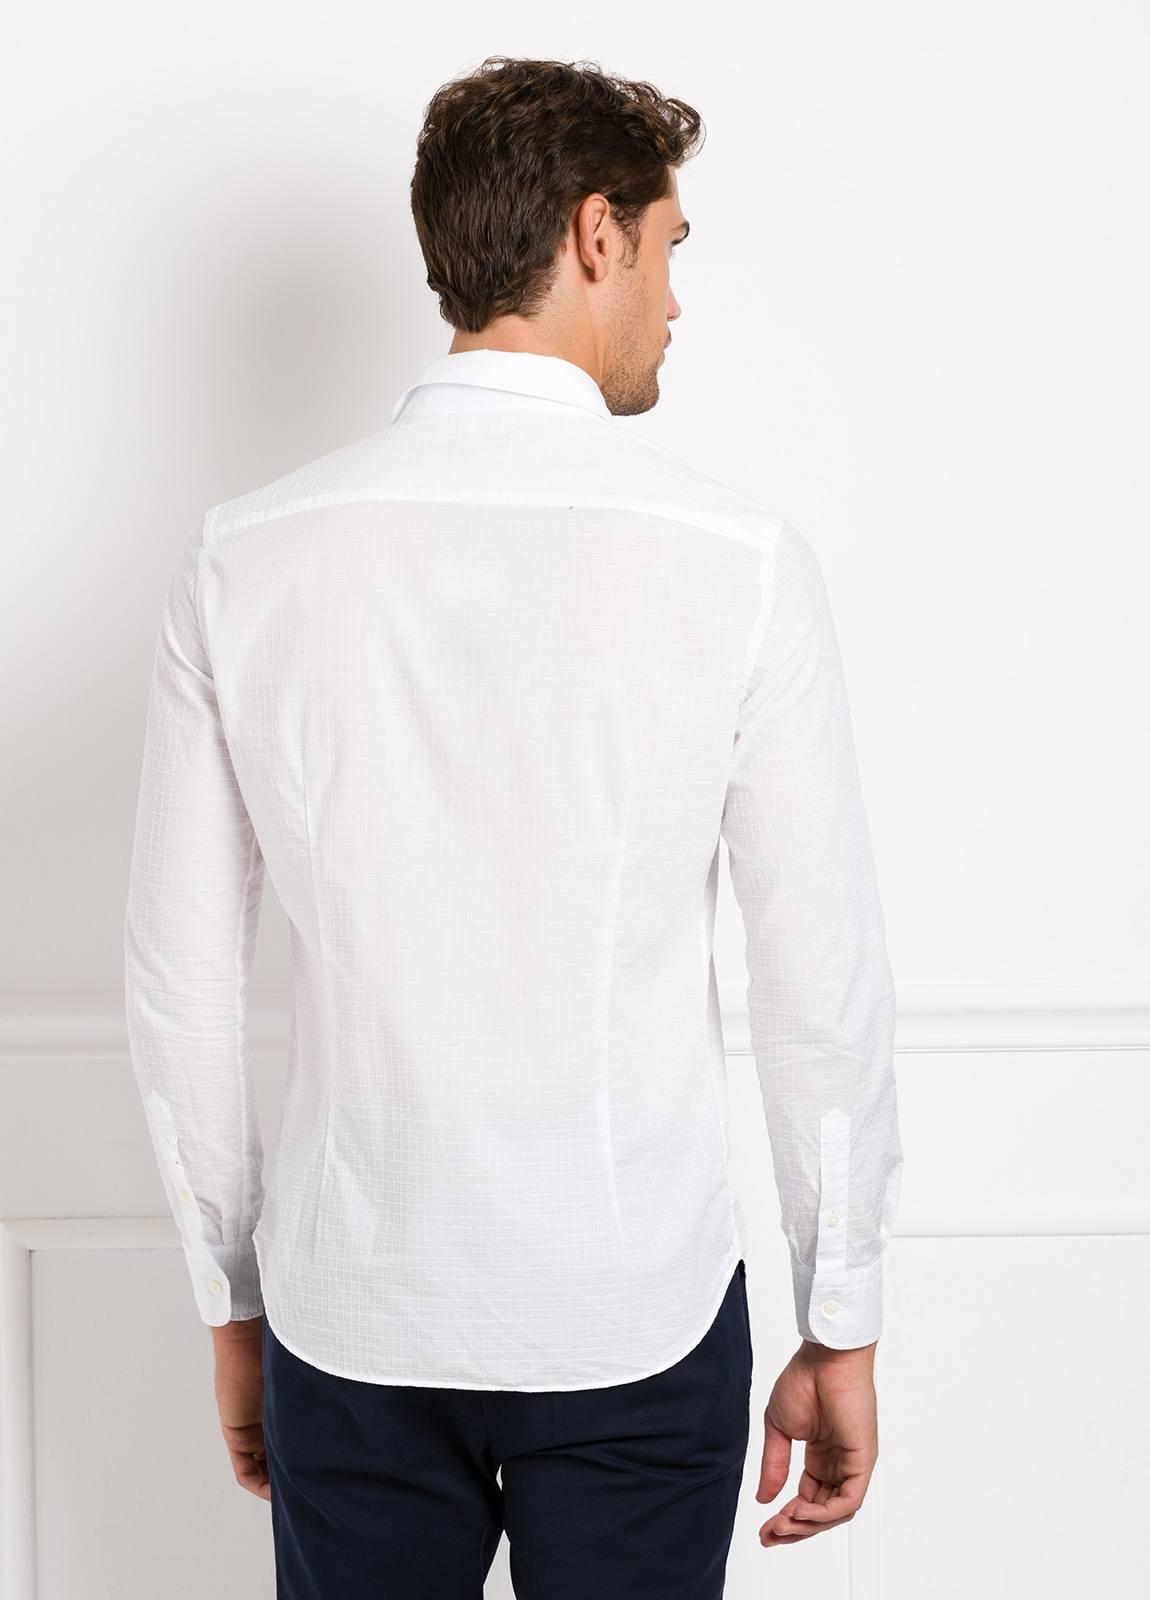 Camisa Leisure Wear SLIM FIT Modelo CAPRI tejido cuadro ventana color blanco, 100% Algodón. - Ítem4